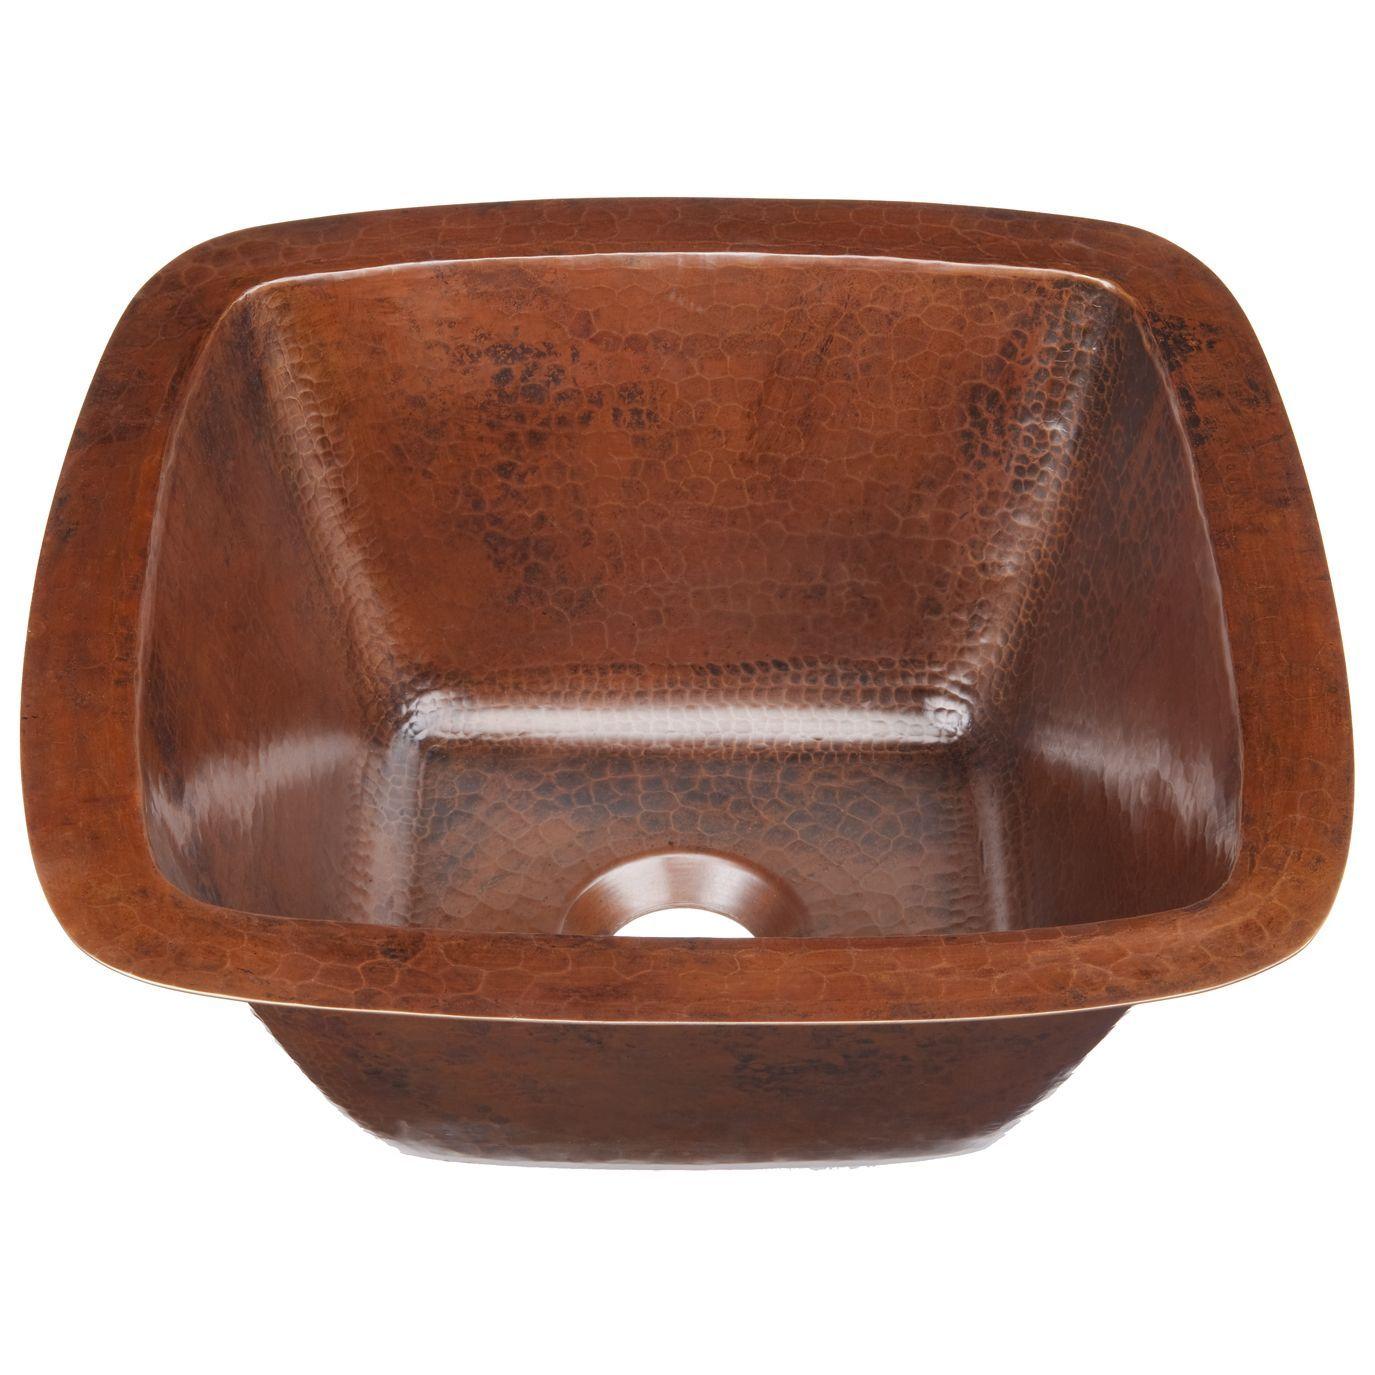 Sinkology Pollock Dual Copper 12 Copper Bar Prep Sink In Aged Copper Black Copper Bar Sink Copper Sink Bathroom